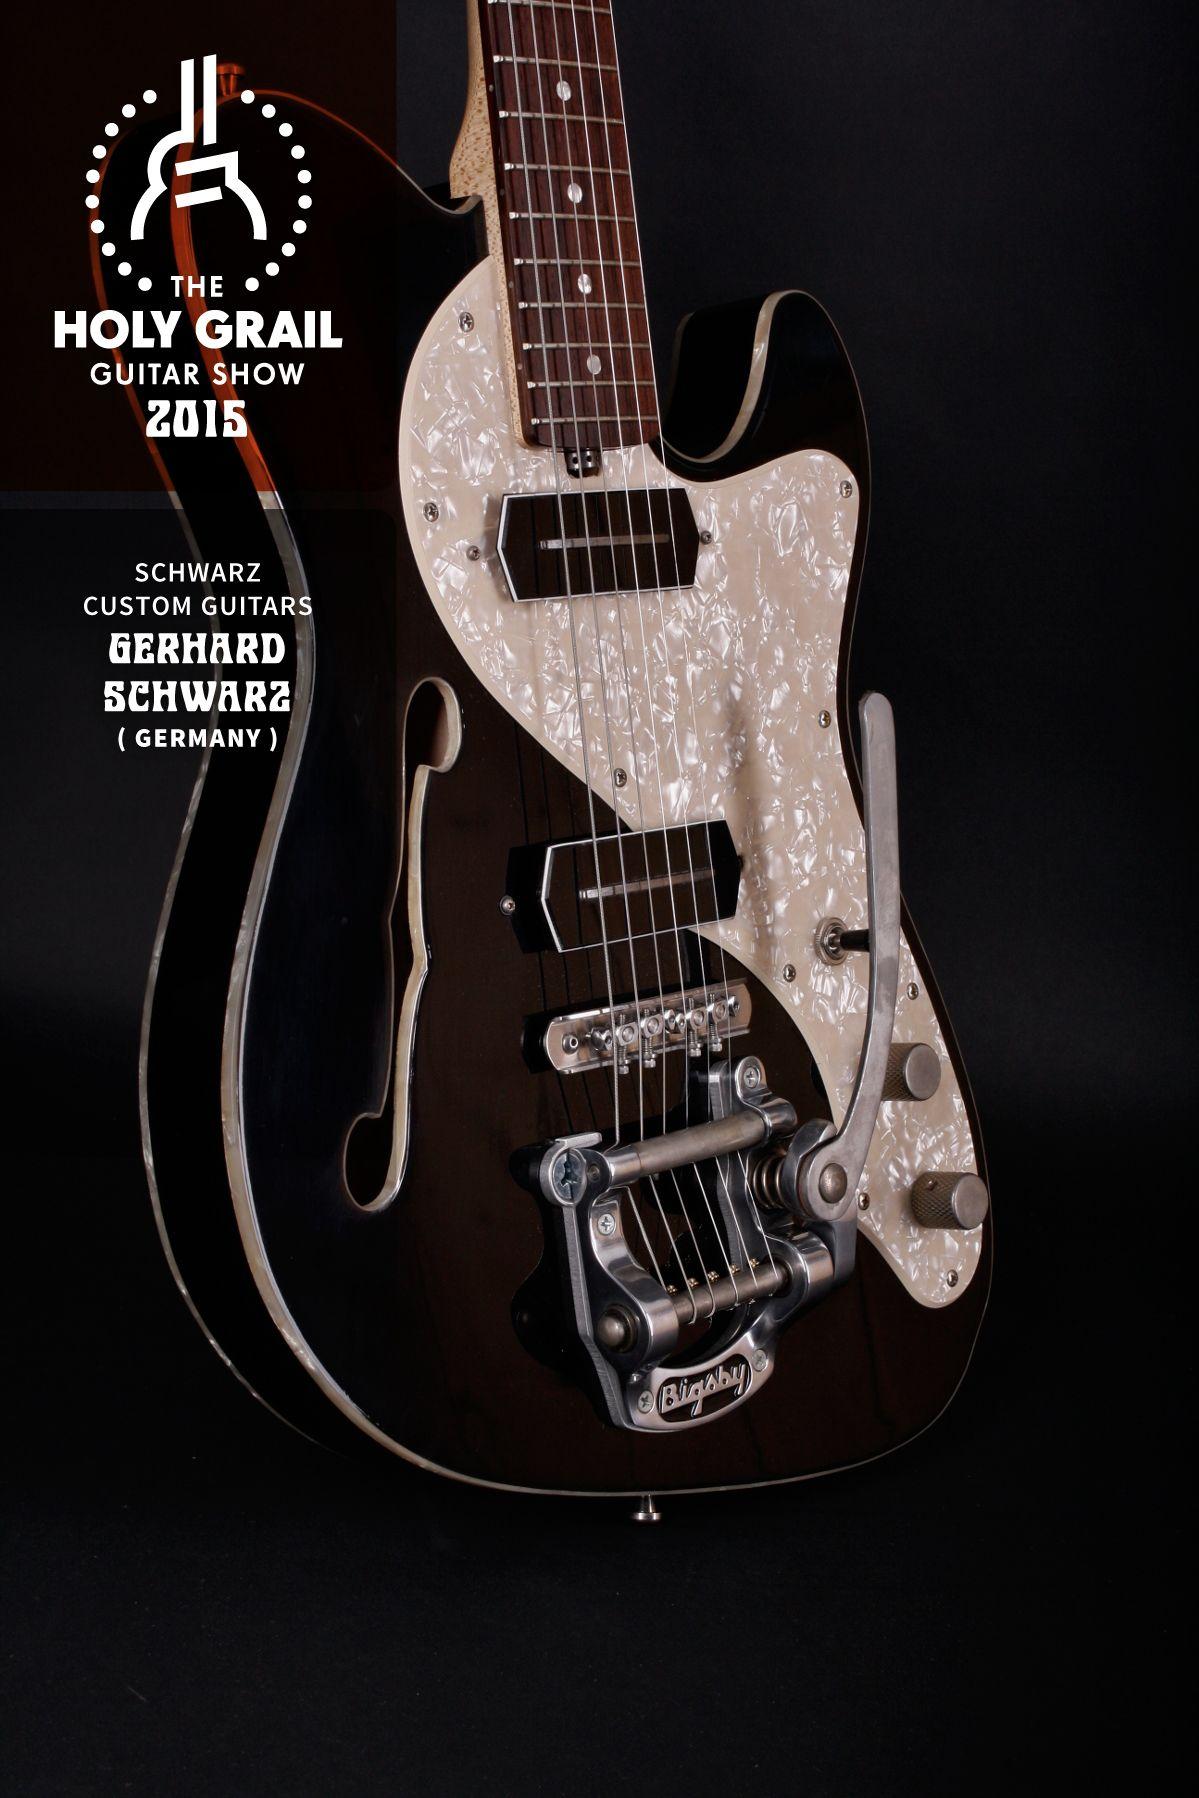 Exhibitor at the Holy Grail Guitar Show 2015: Gerhard Schwarz, Schwarz Custom Guitars, Germany. www.schwarz-custom.de, https://www.facebook.com/pages/Schwarz-Custom-Guitars/179572578720057 http://holygrailguitarshow.com/exhibitors/schwarz-custom-guitars/